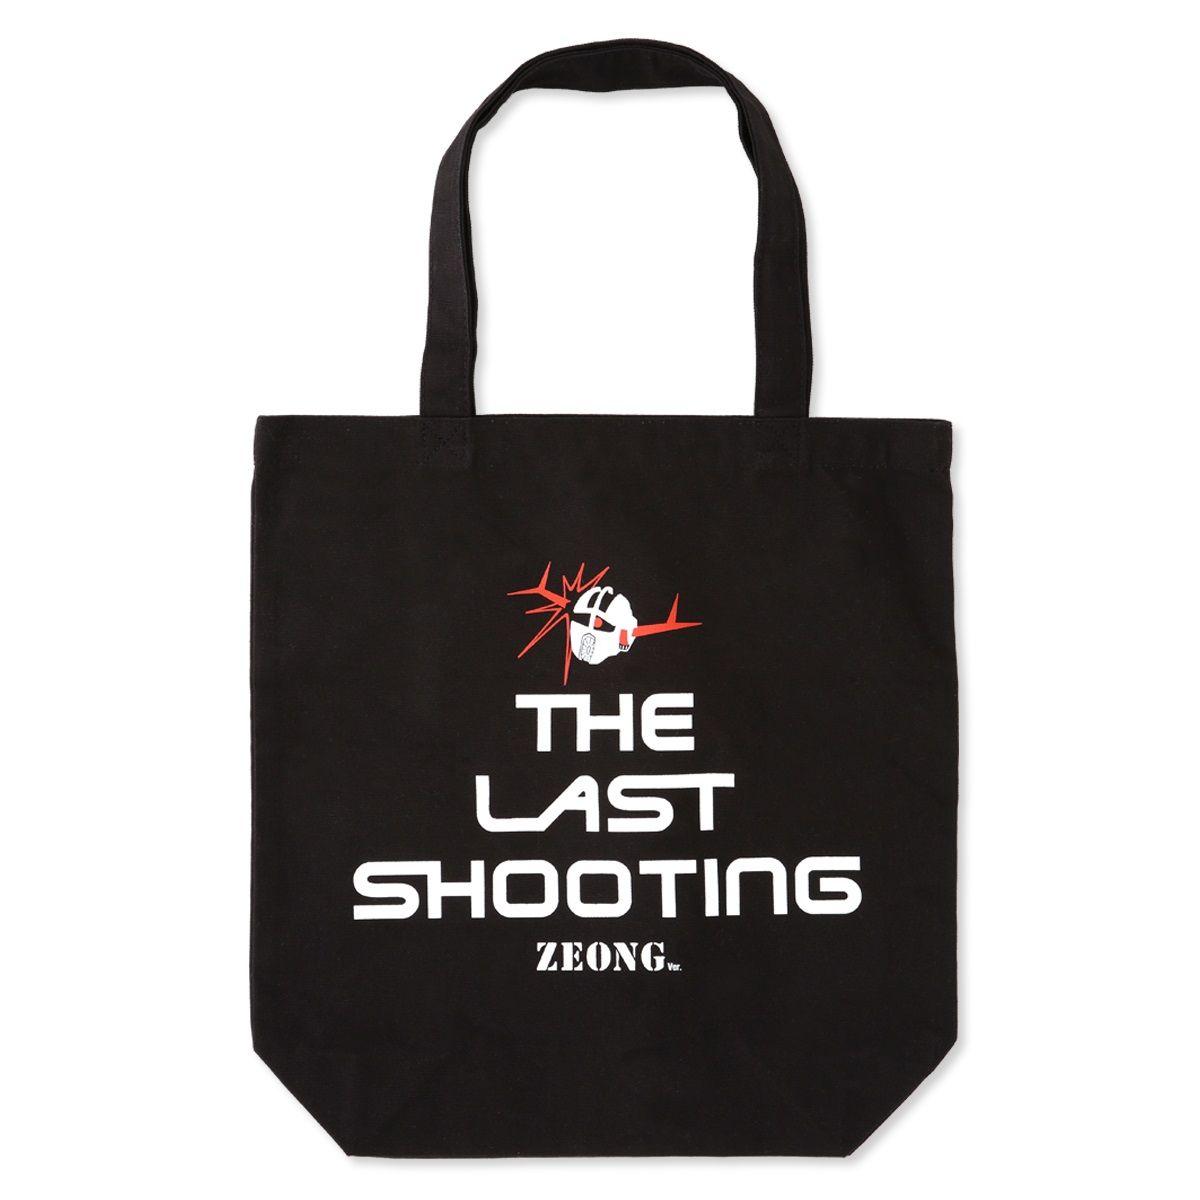 Mobile Suit Gundam The Last Shooting Zeong Tote Bag